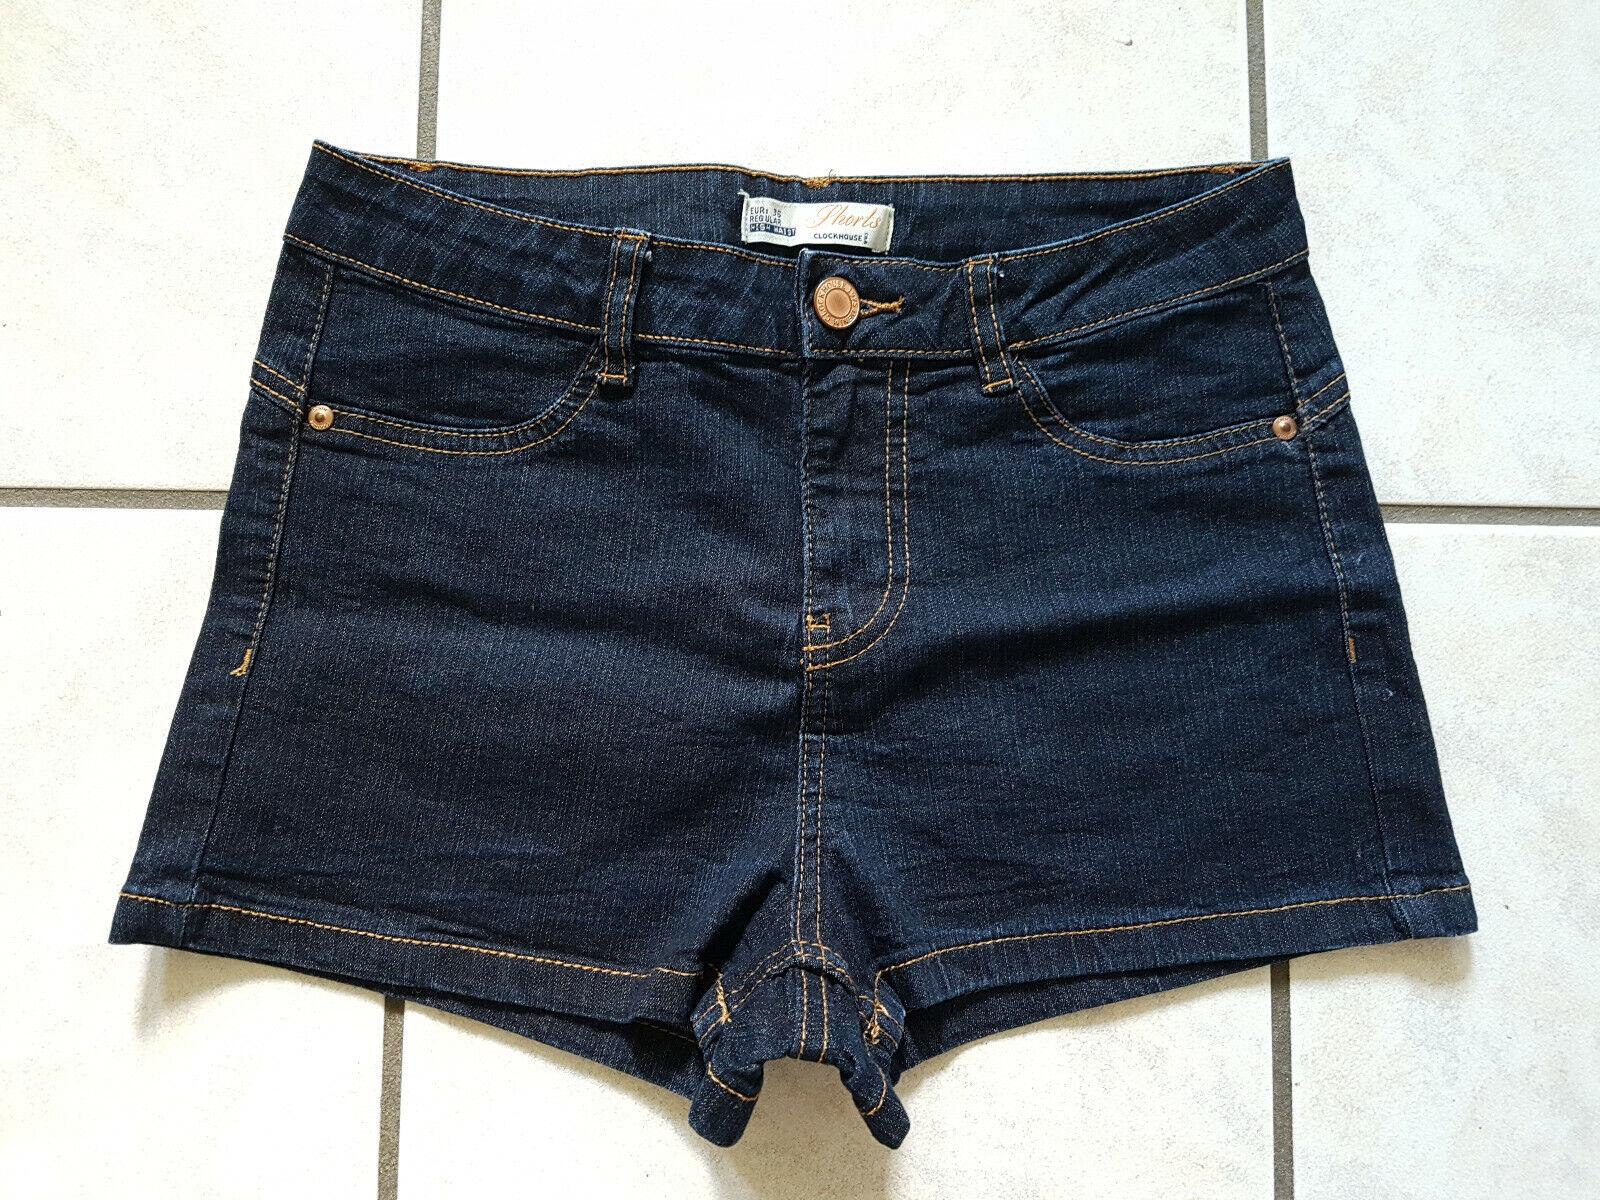 Clockhouse High Waist Shorts Größe 36 Dark Denim Dunkelblau Jeans Hot Pants